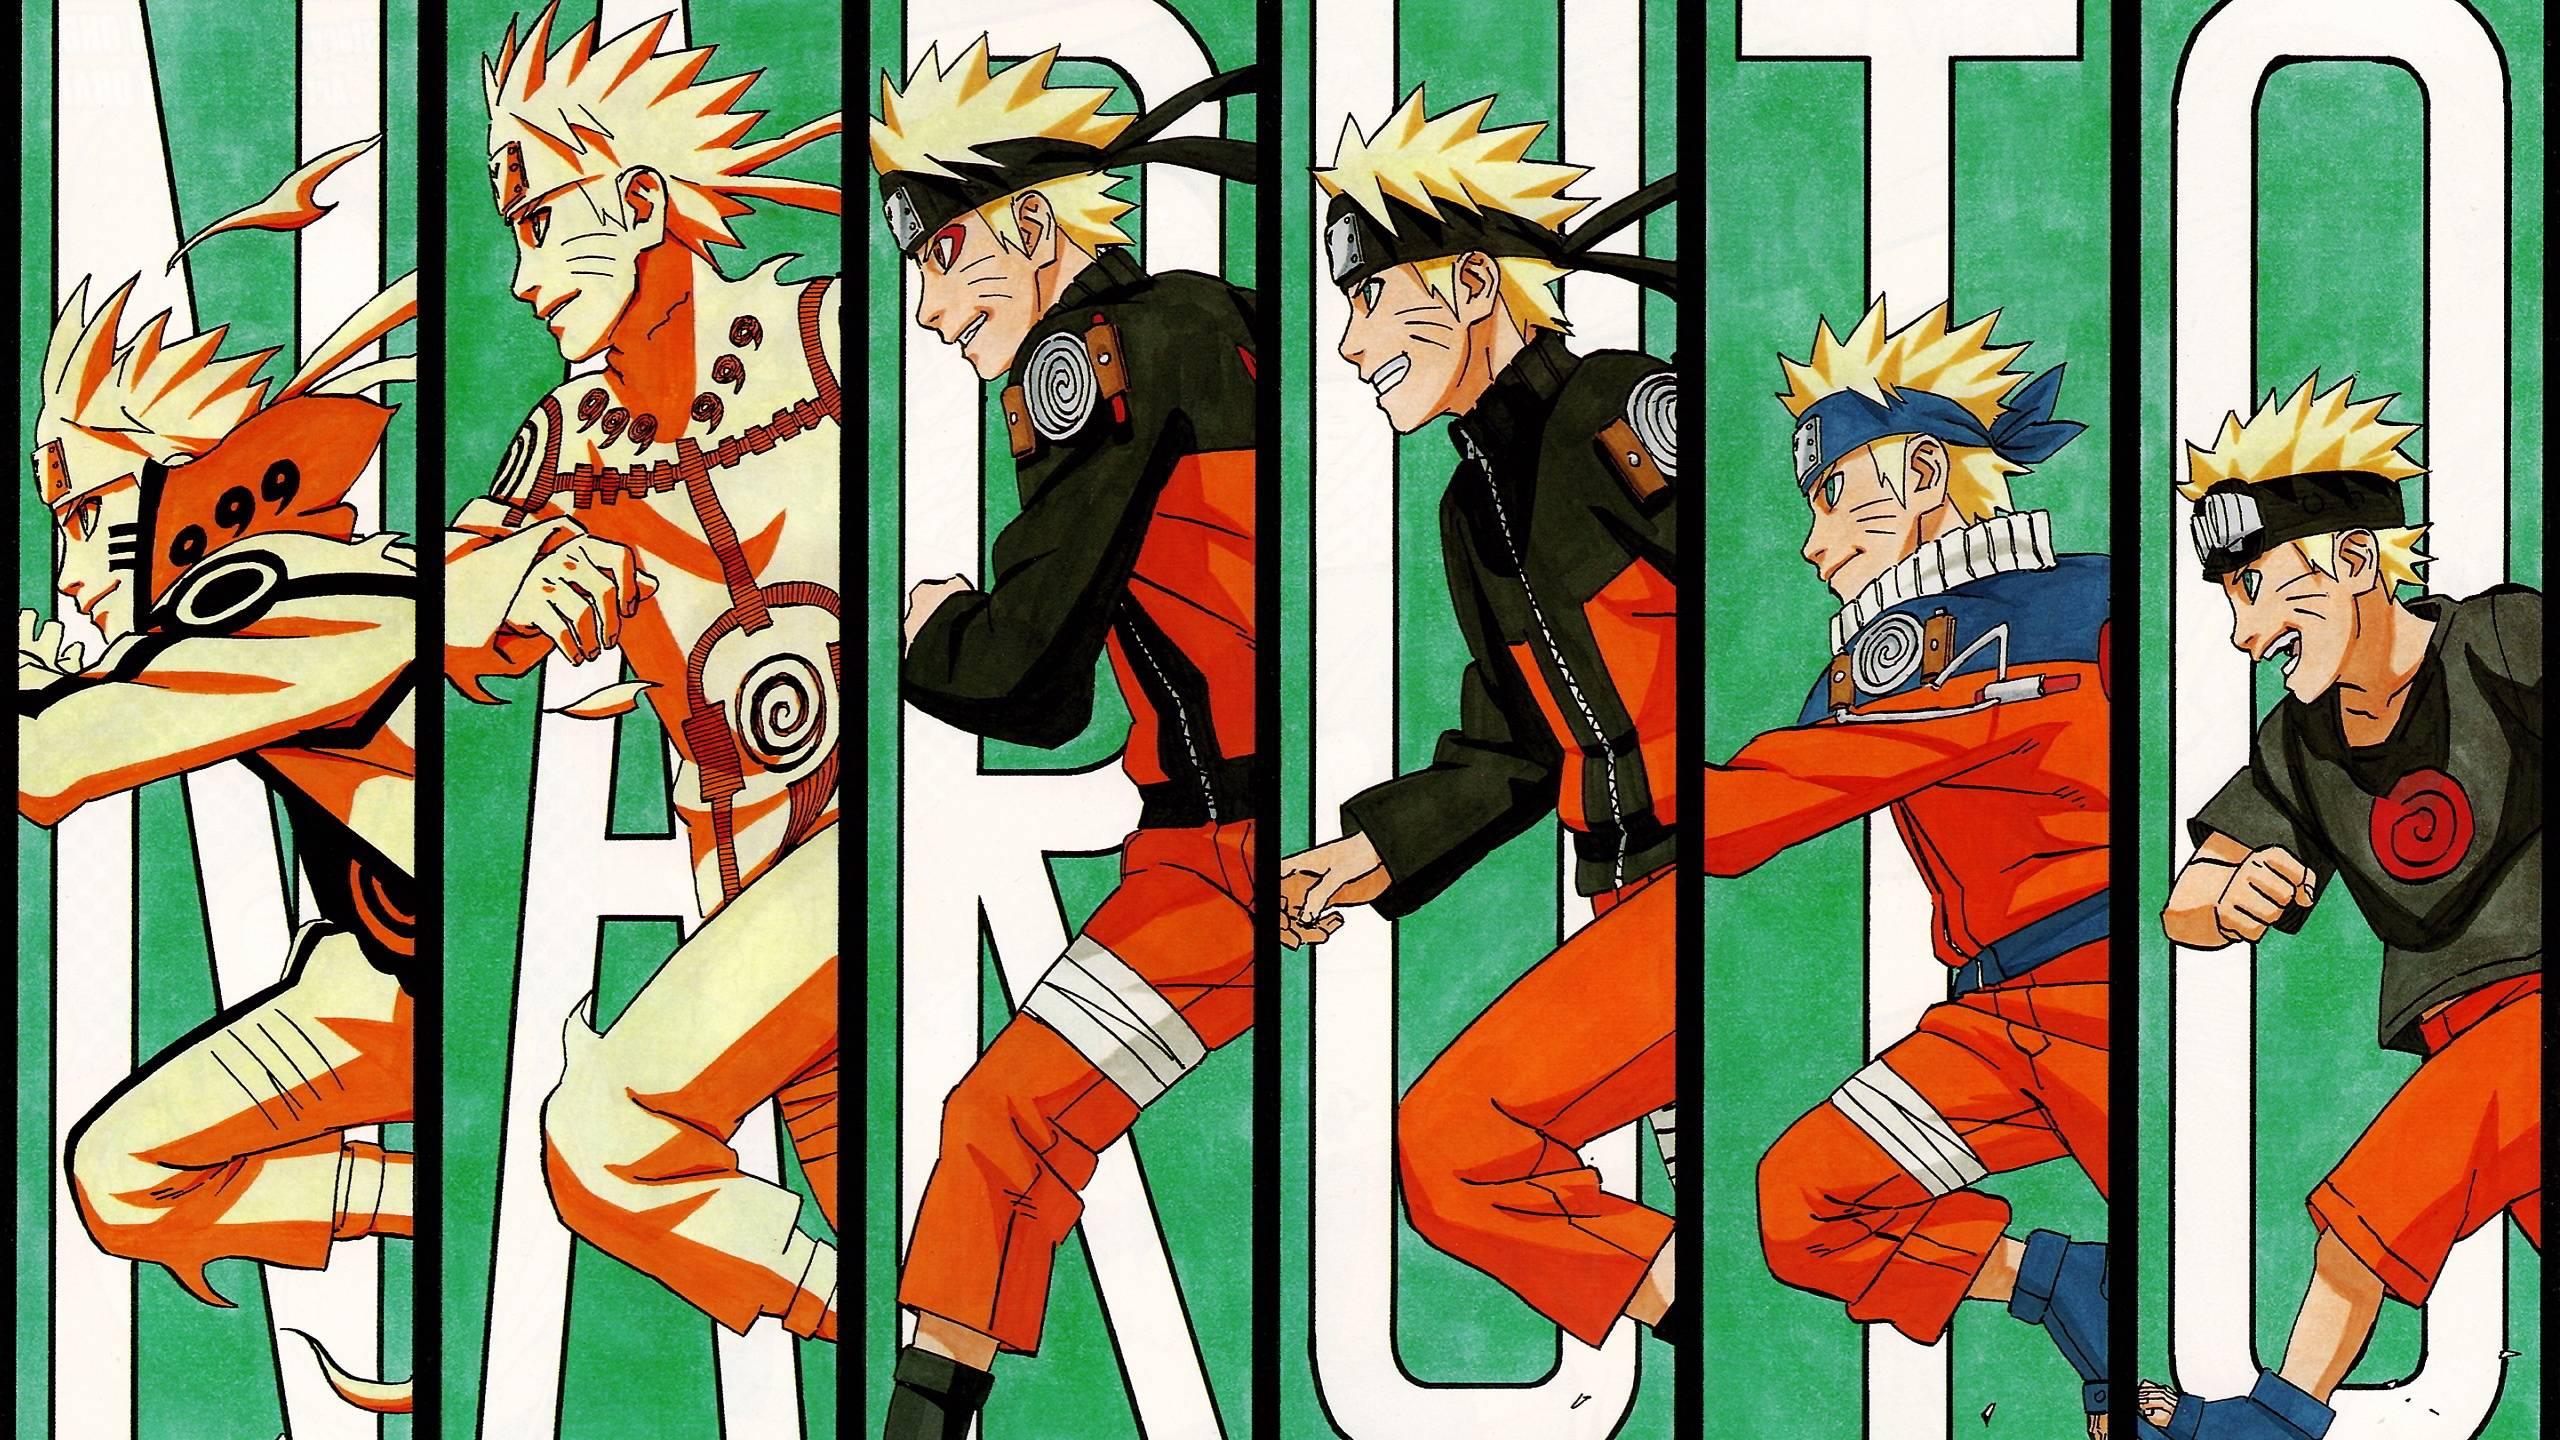 Naruto Wallpaper 1080p 2560x1440 Wallpaper Teahub Io